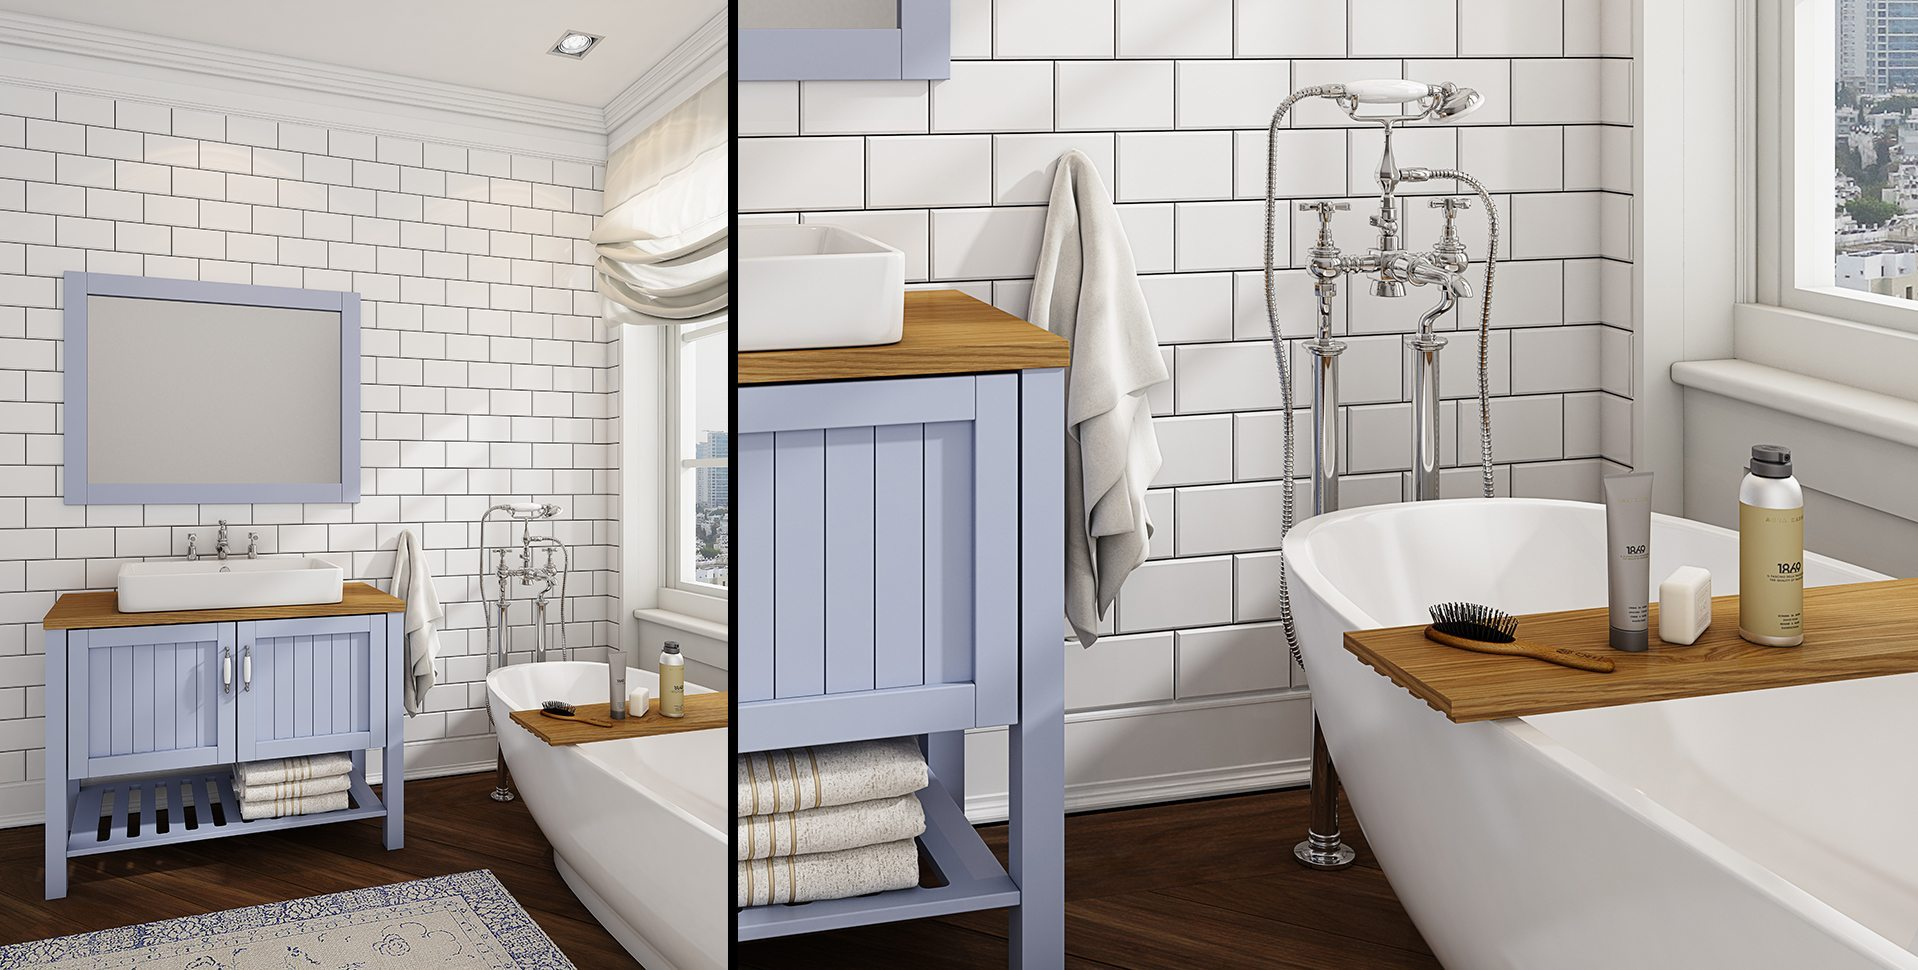 Product Visualization: Bathroom Cabinets by El-Gal, Classic Bathroom interior Design